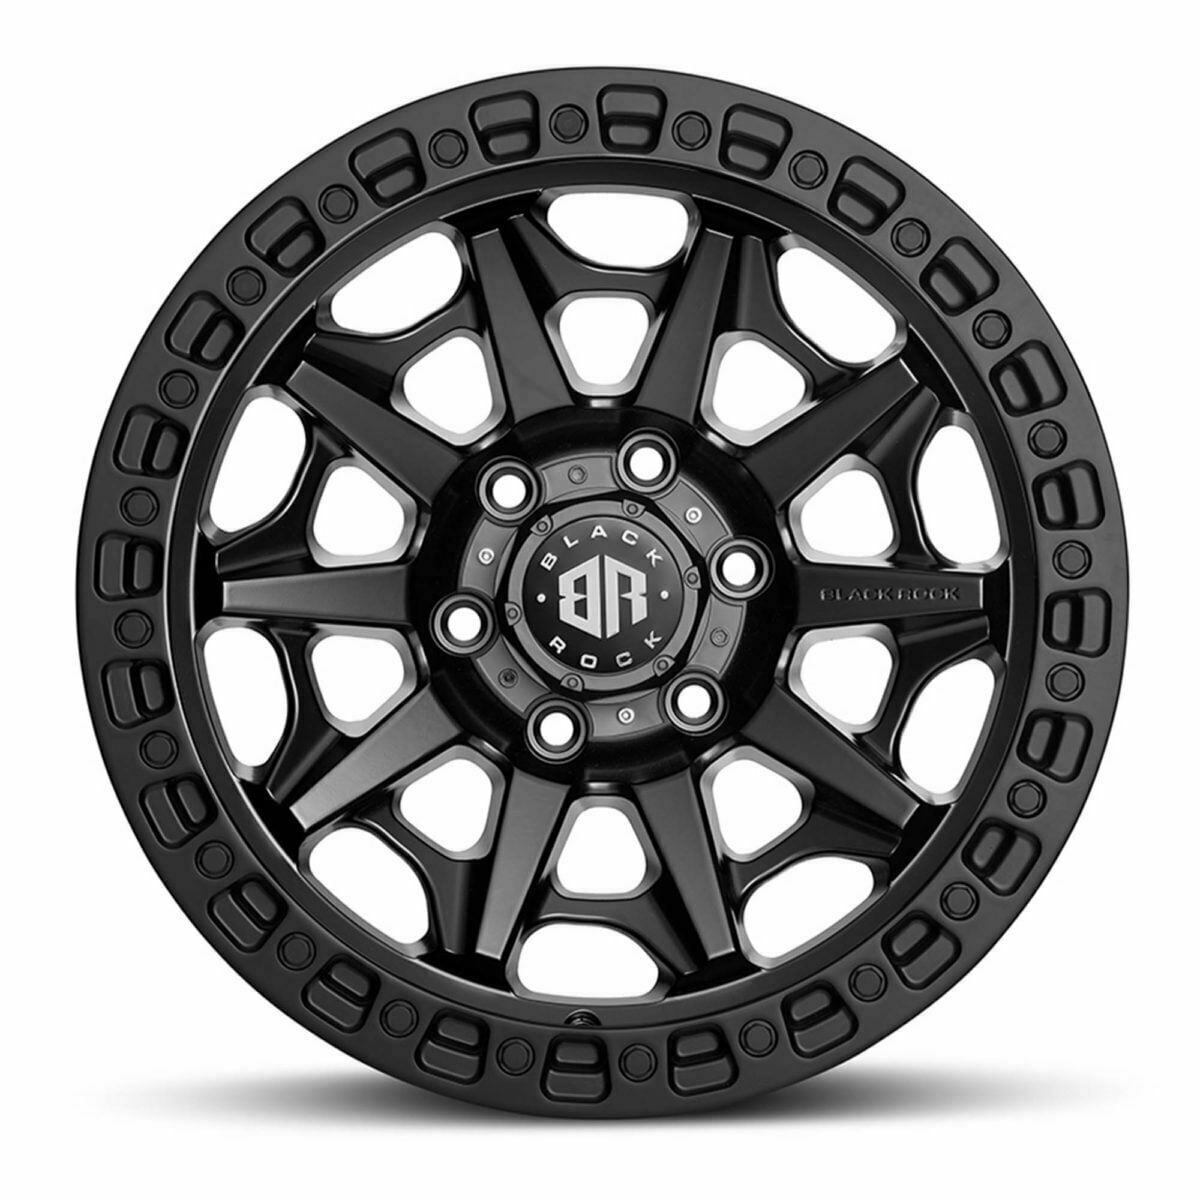 VW Amarok Wheels Black Rock Cage Satin Black Wheels 4x4 Off-Road Rims